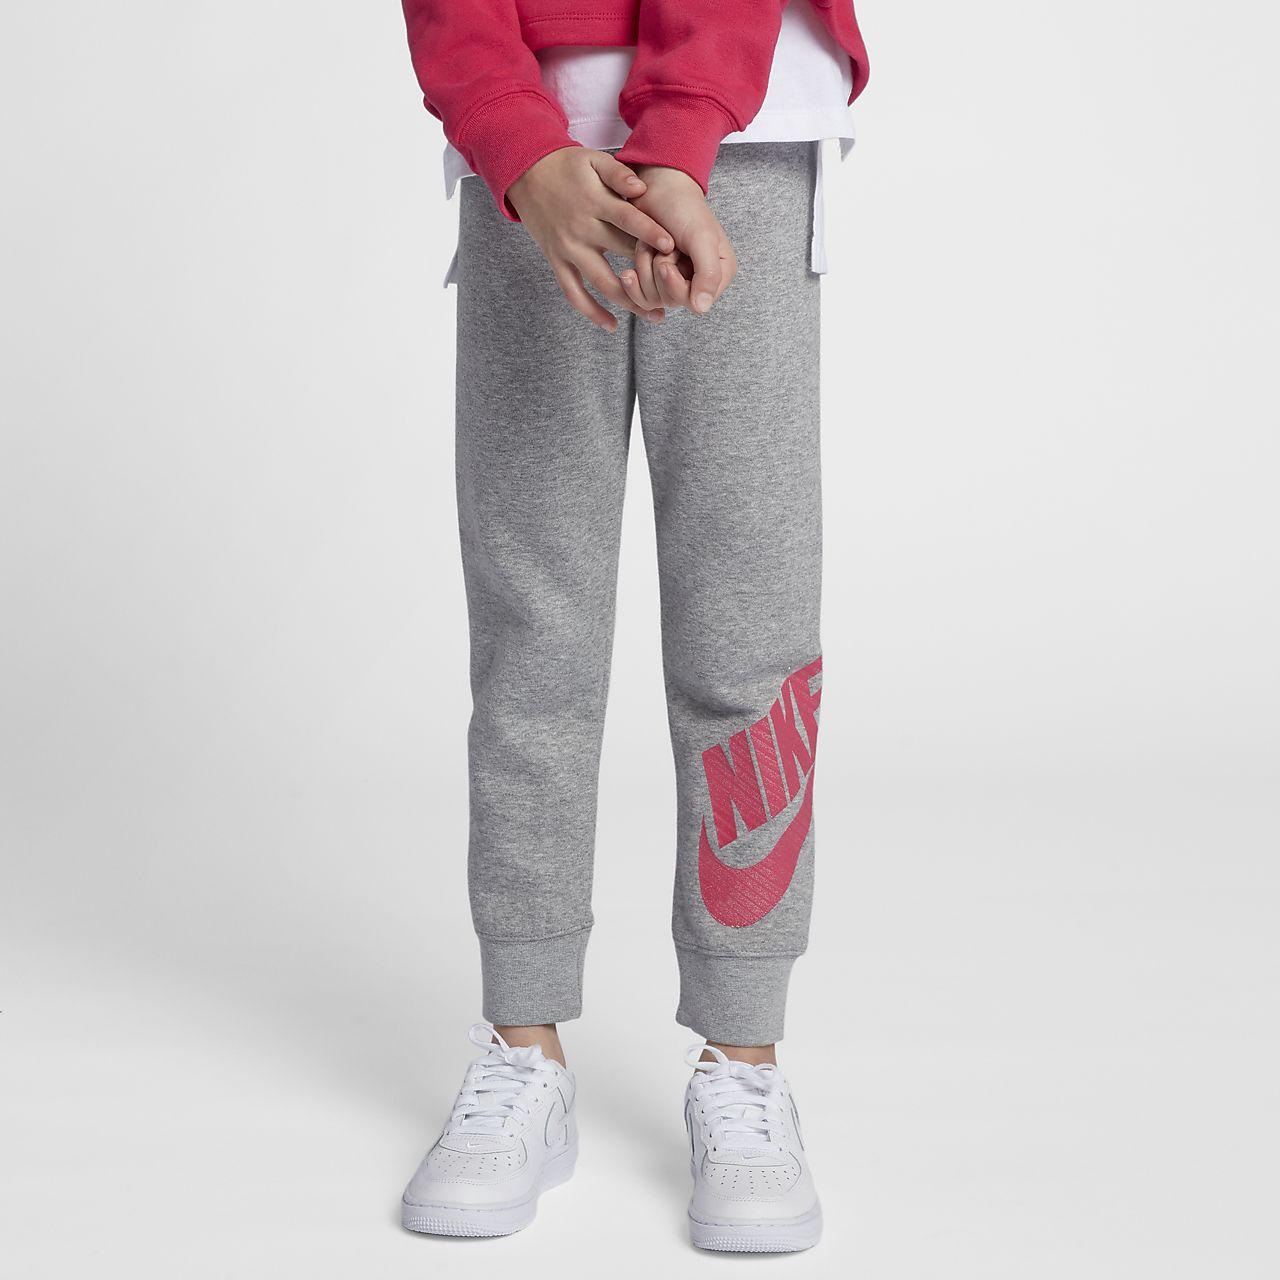 Nike Sportswear Jogger - Niño/a pequeño/a